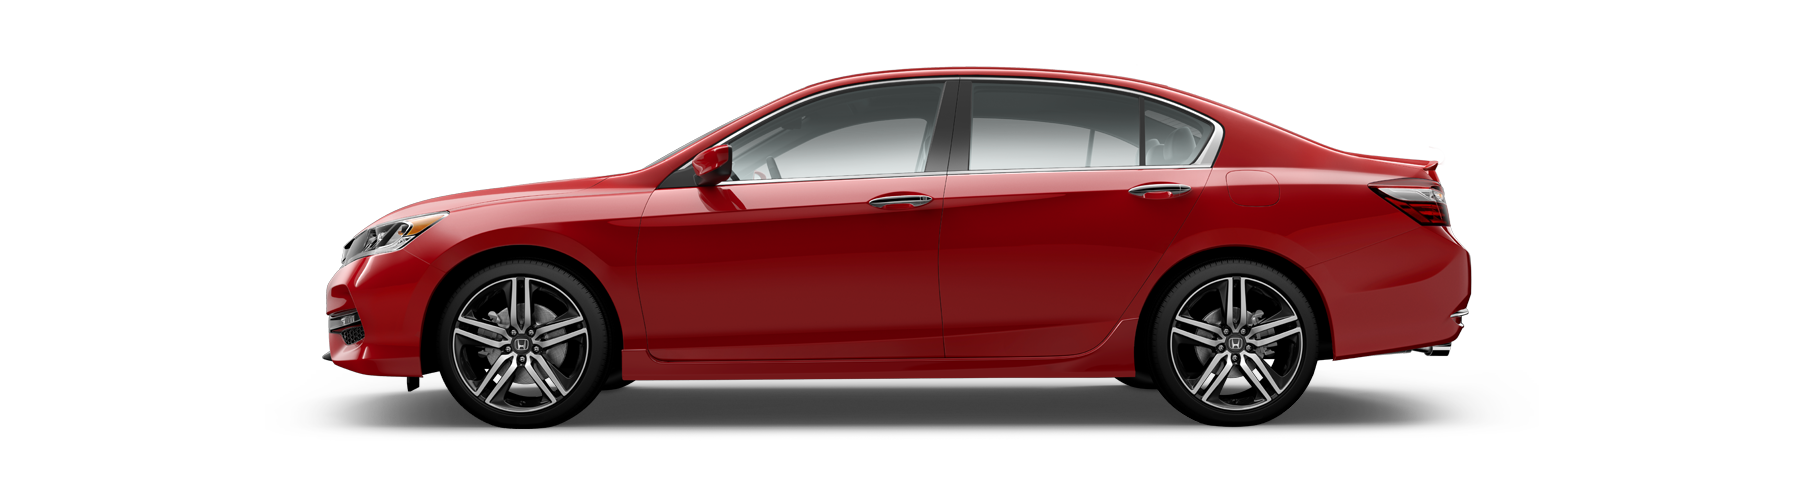 2017 Honda Accord Sedan Side Profile